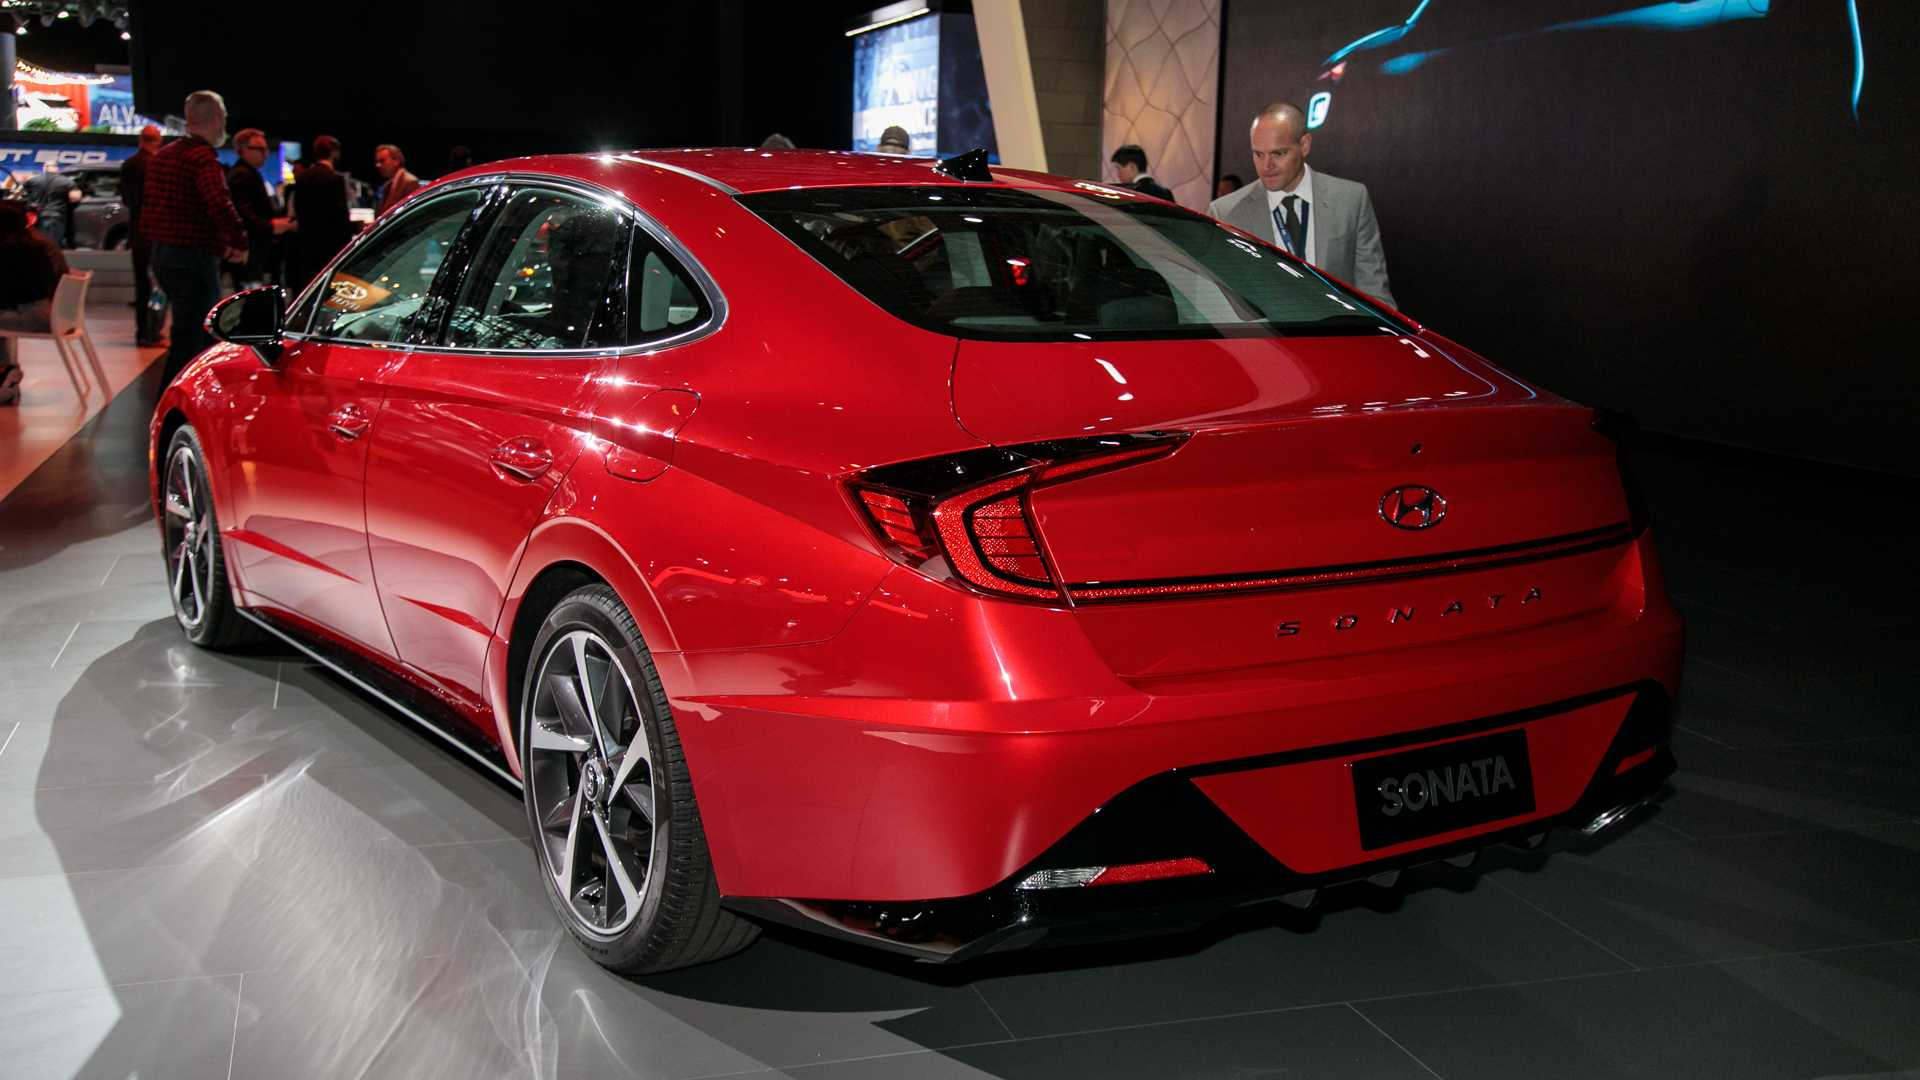 34 Concept of 2020 Hyundai Sonata N Line Review by 2020 Hyundai Sonata N Line